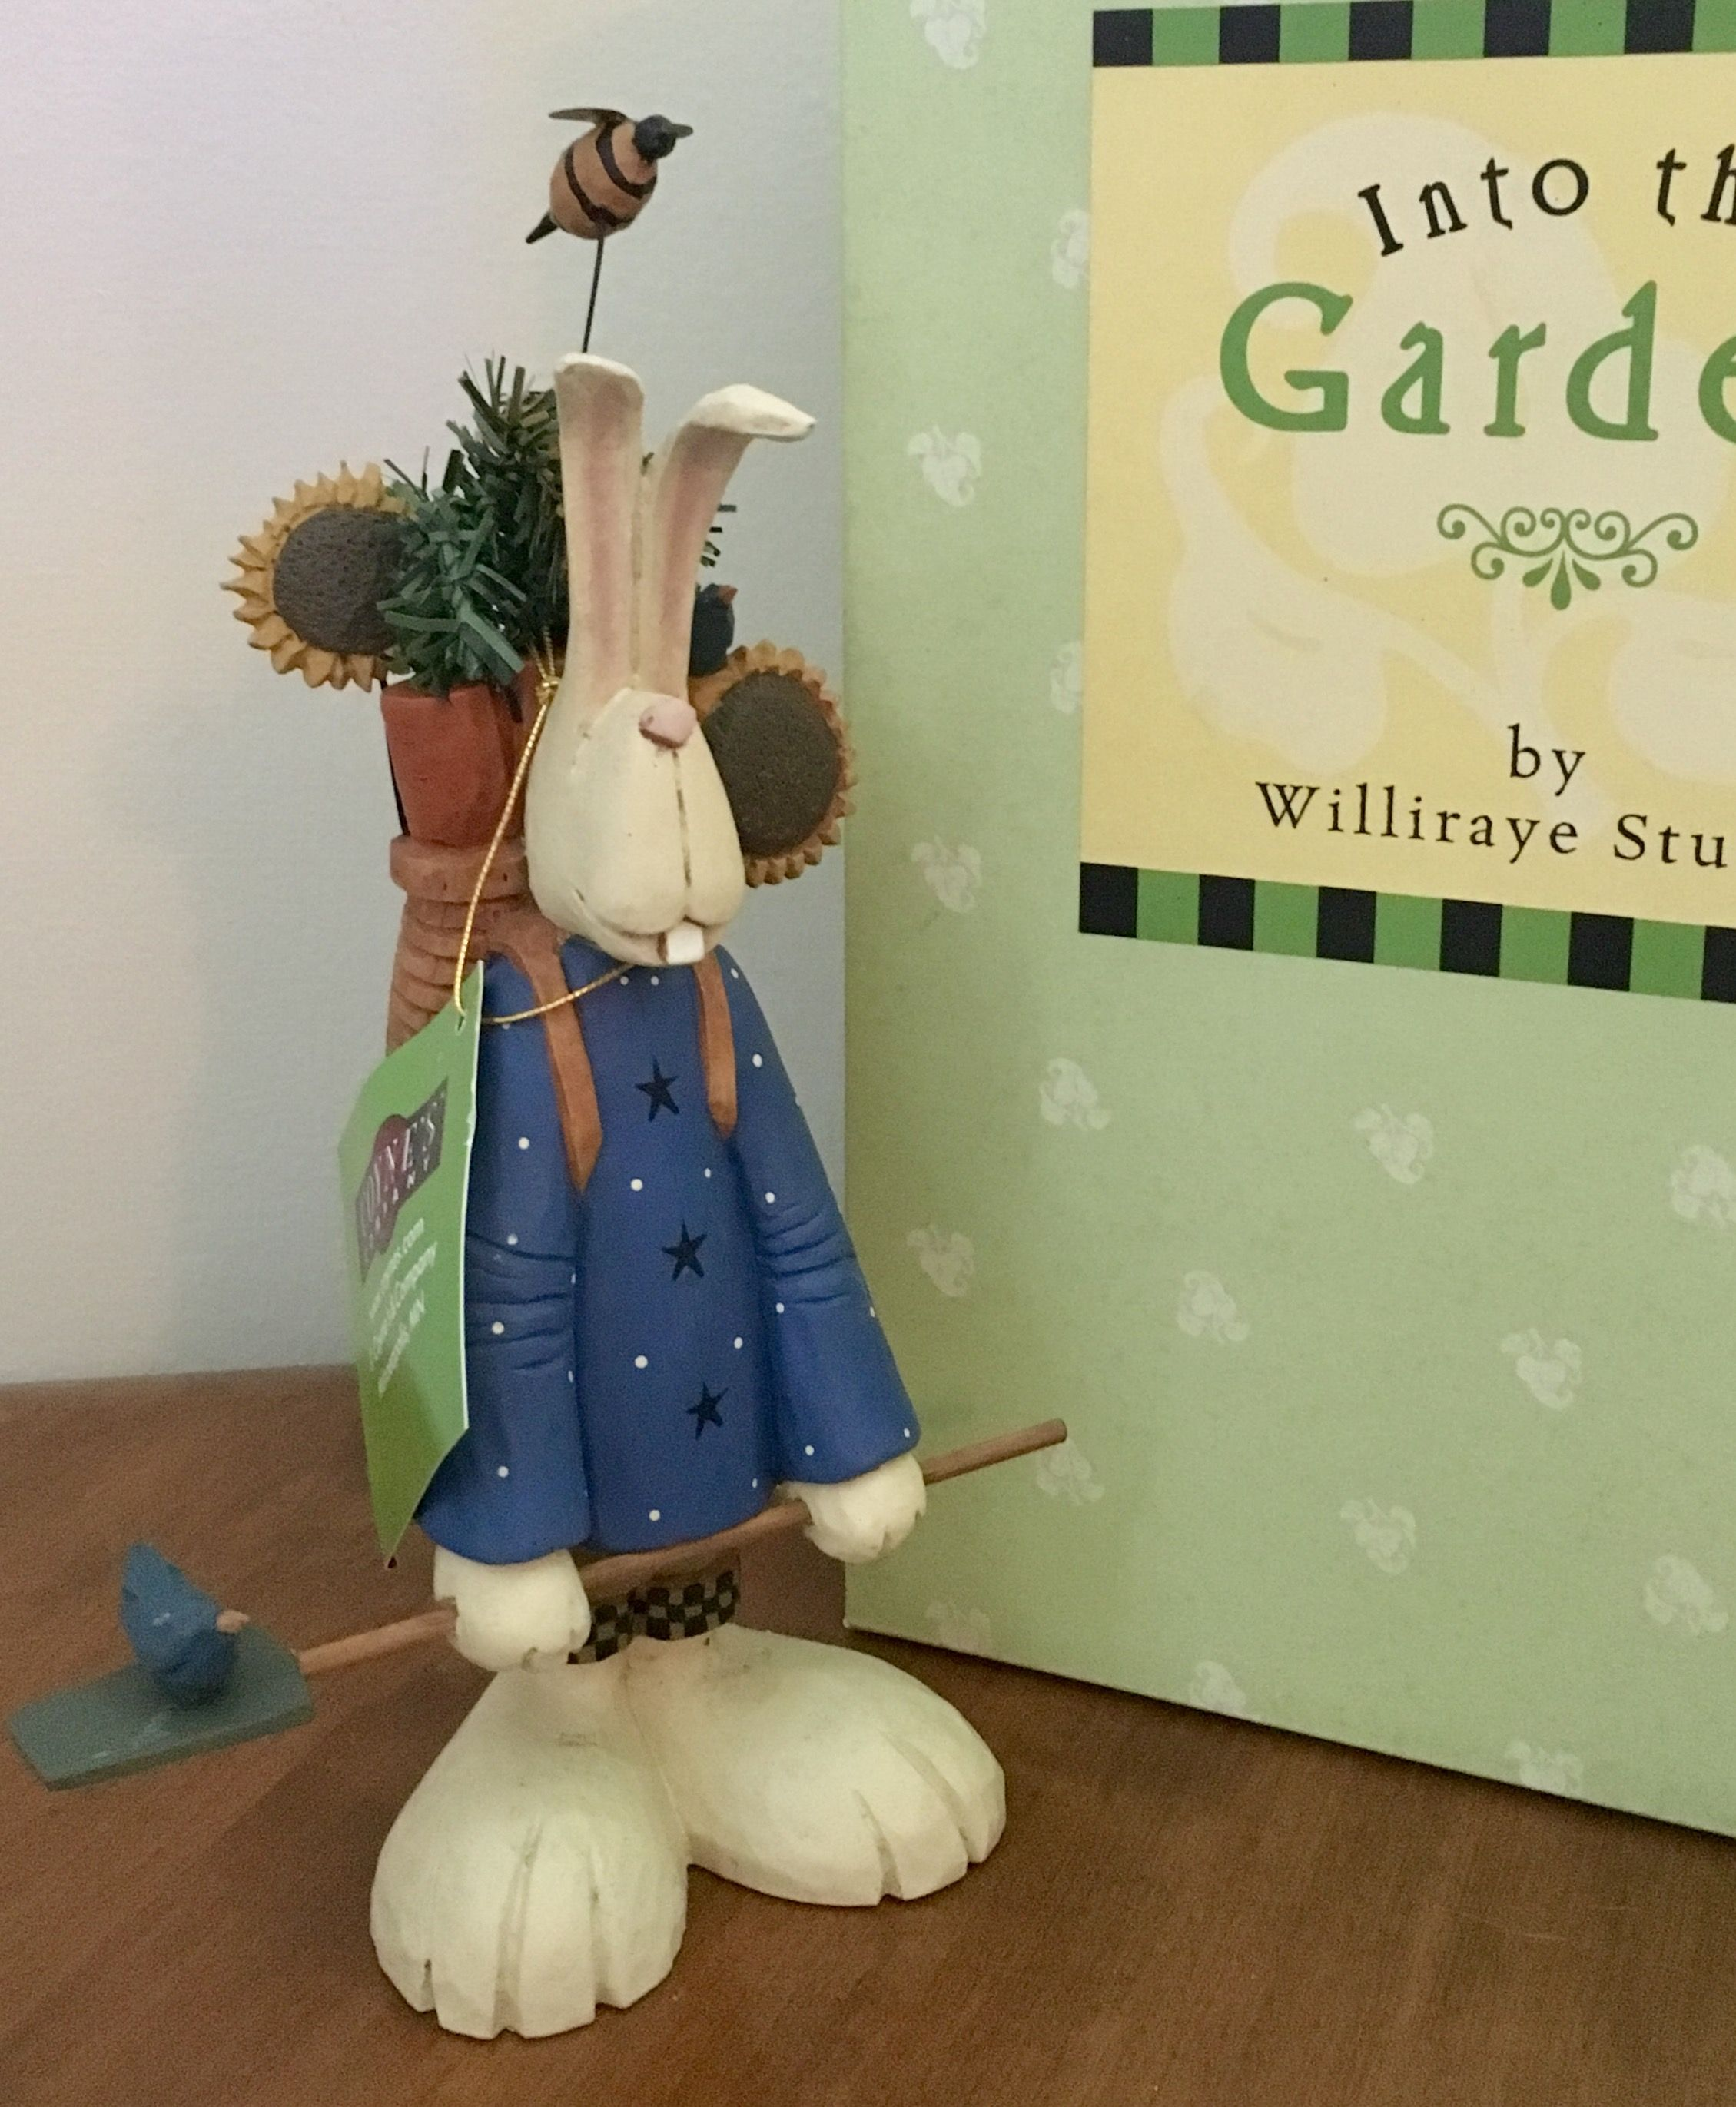 Williraye Studio, Into The Garden, Garden Helper, Boy WW7403